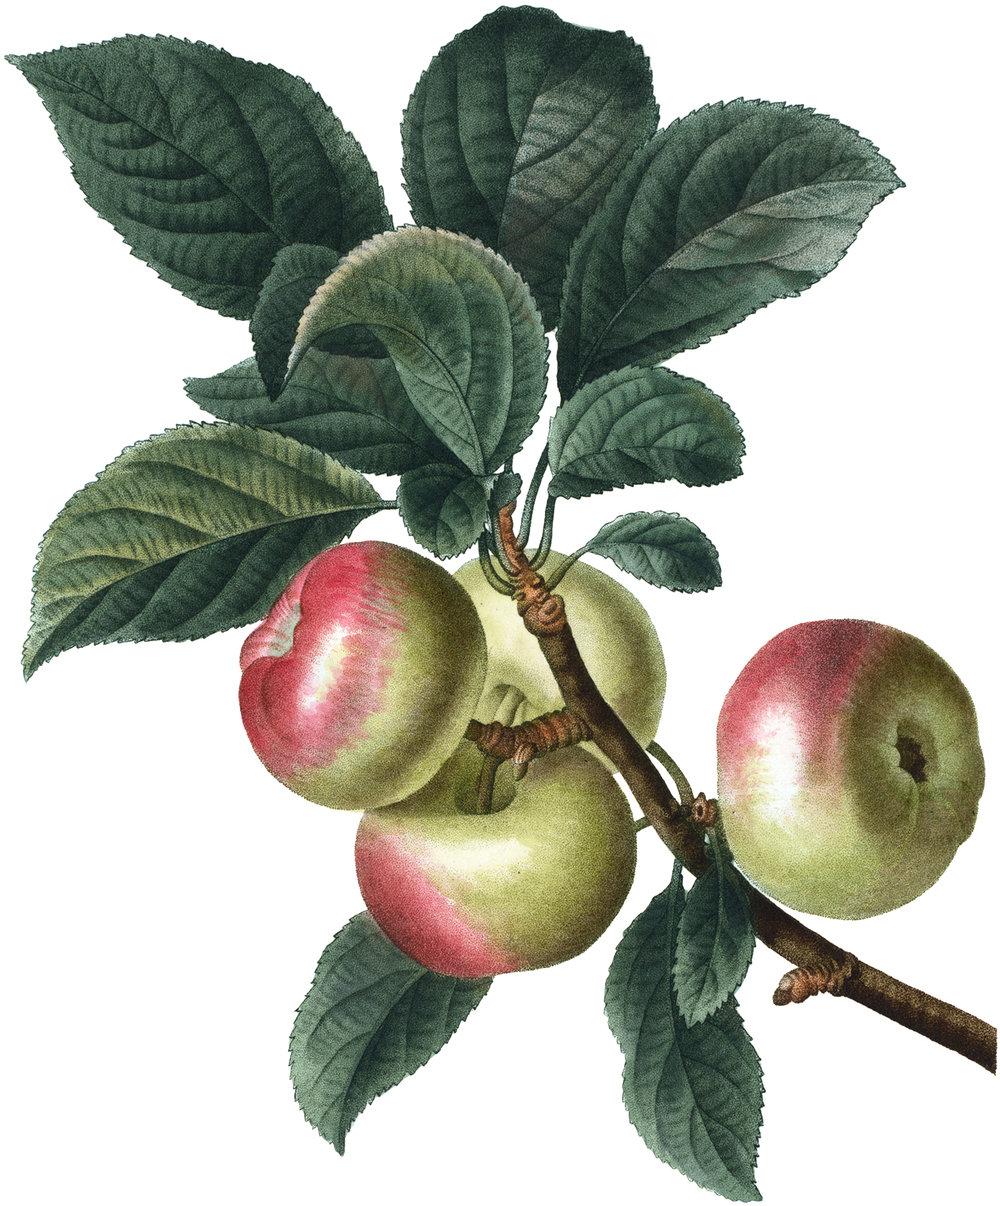 Botanical-Apples-Image-GraphicsFairy.jpg